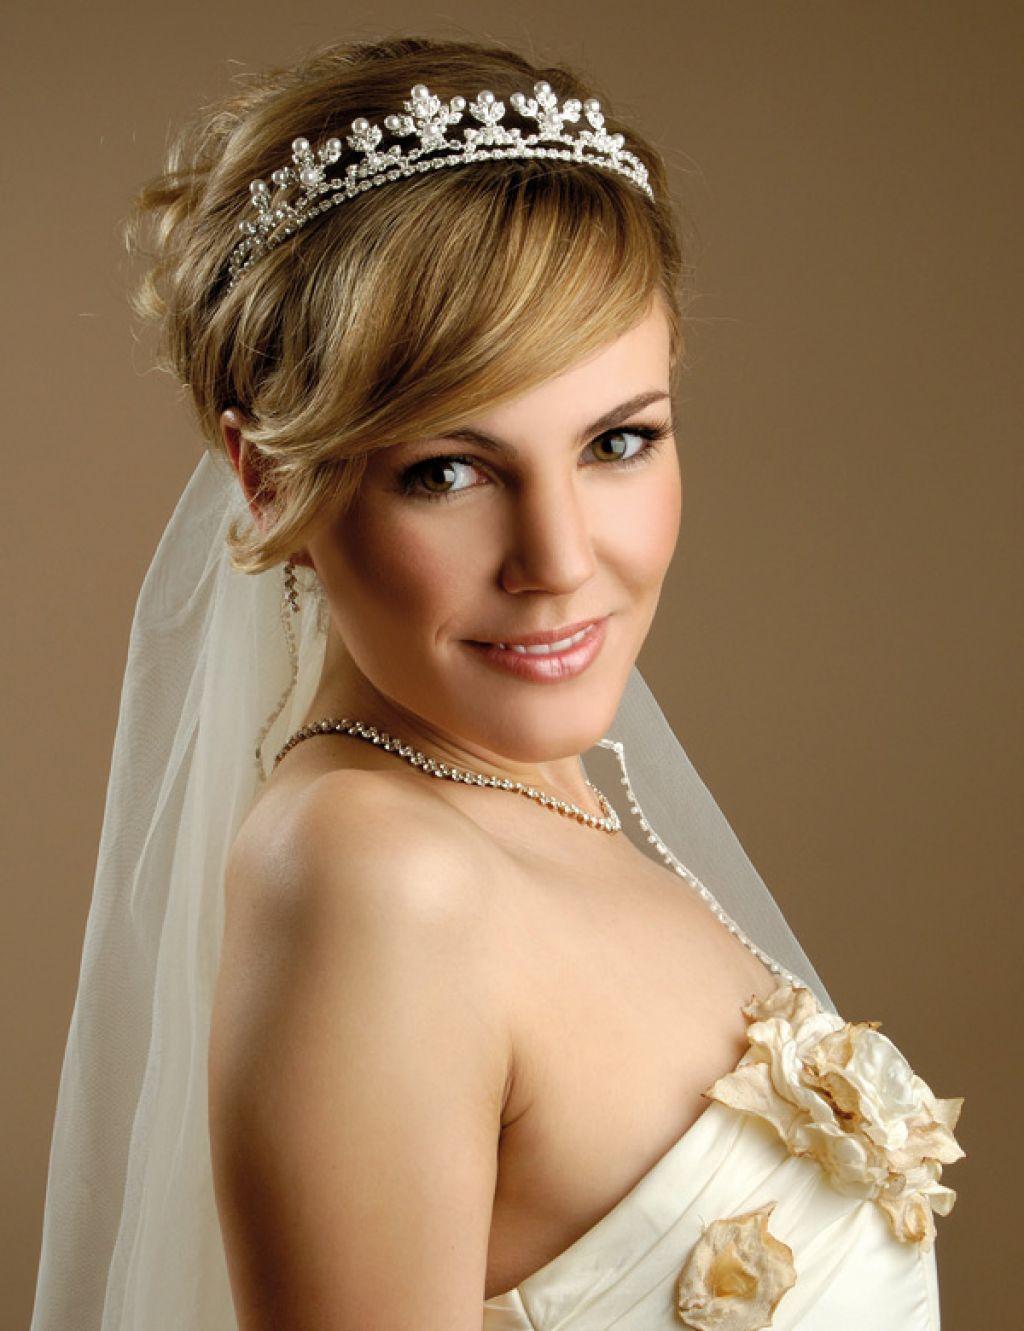 bridal short hair with veil fashions | wedding hair | short